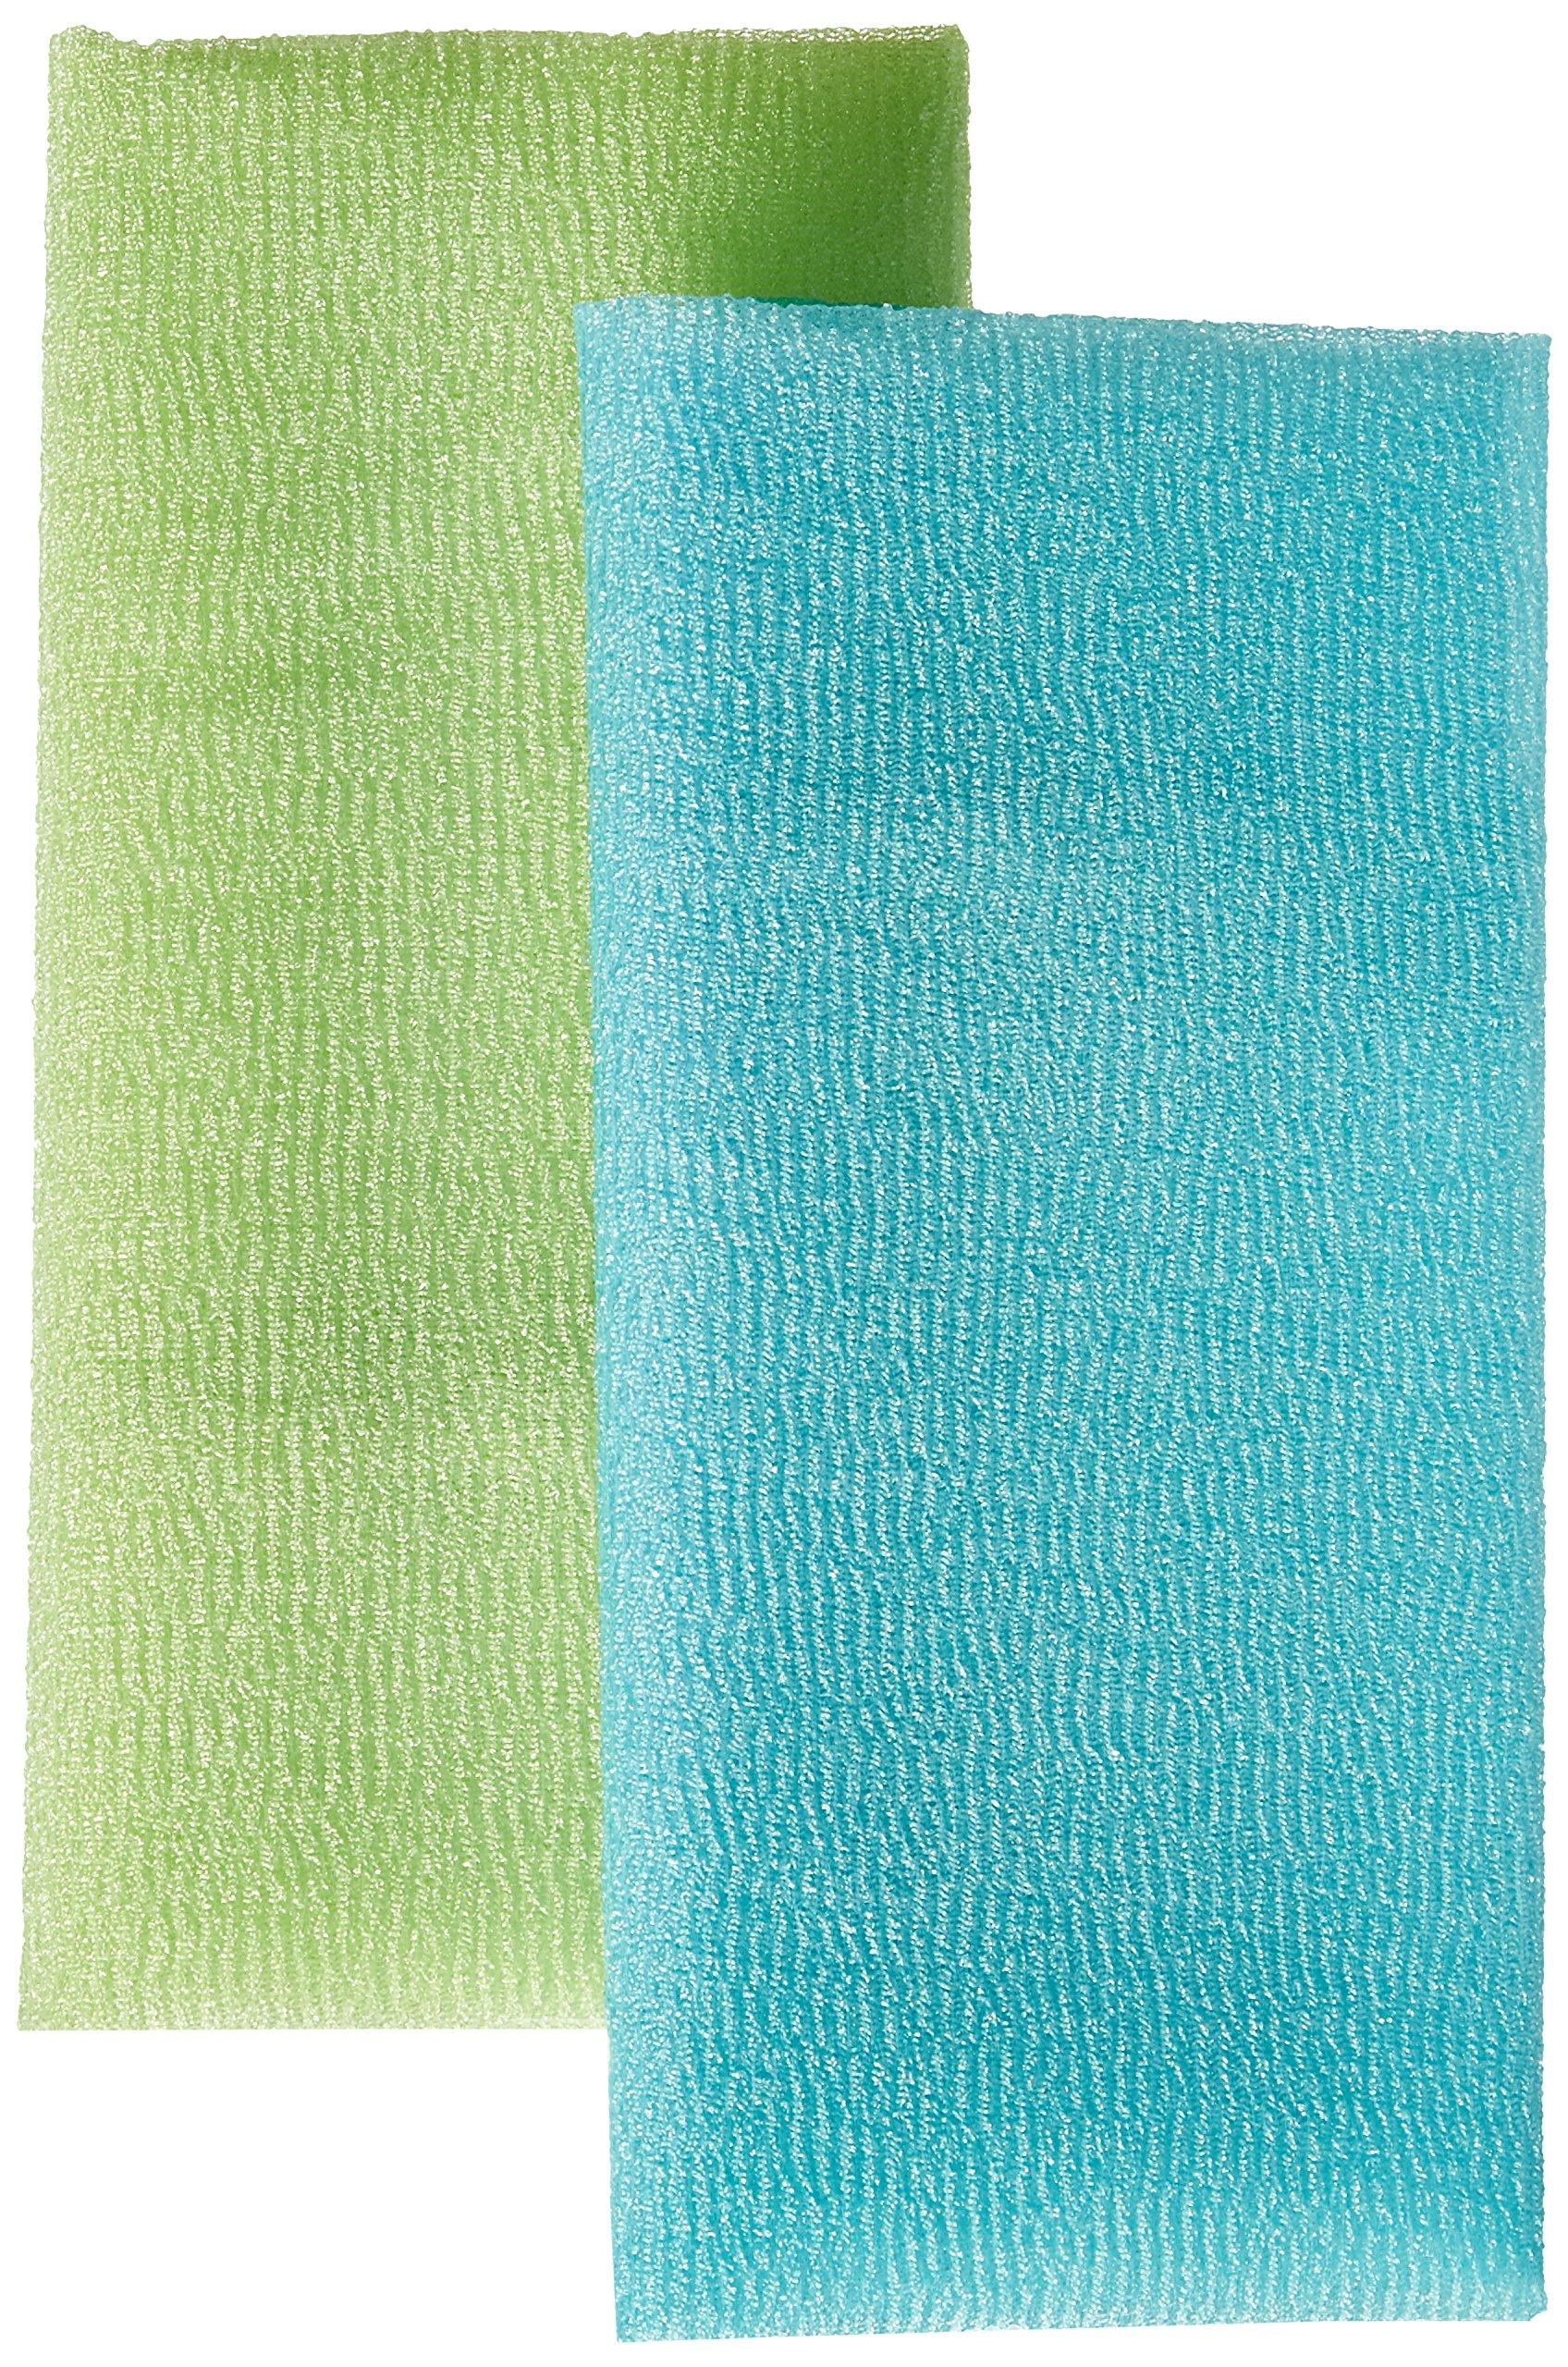 Bath Accessories Bigger Twin Skin Polishing Towels, Blue Celery